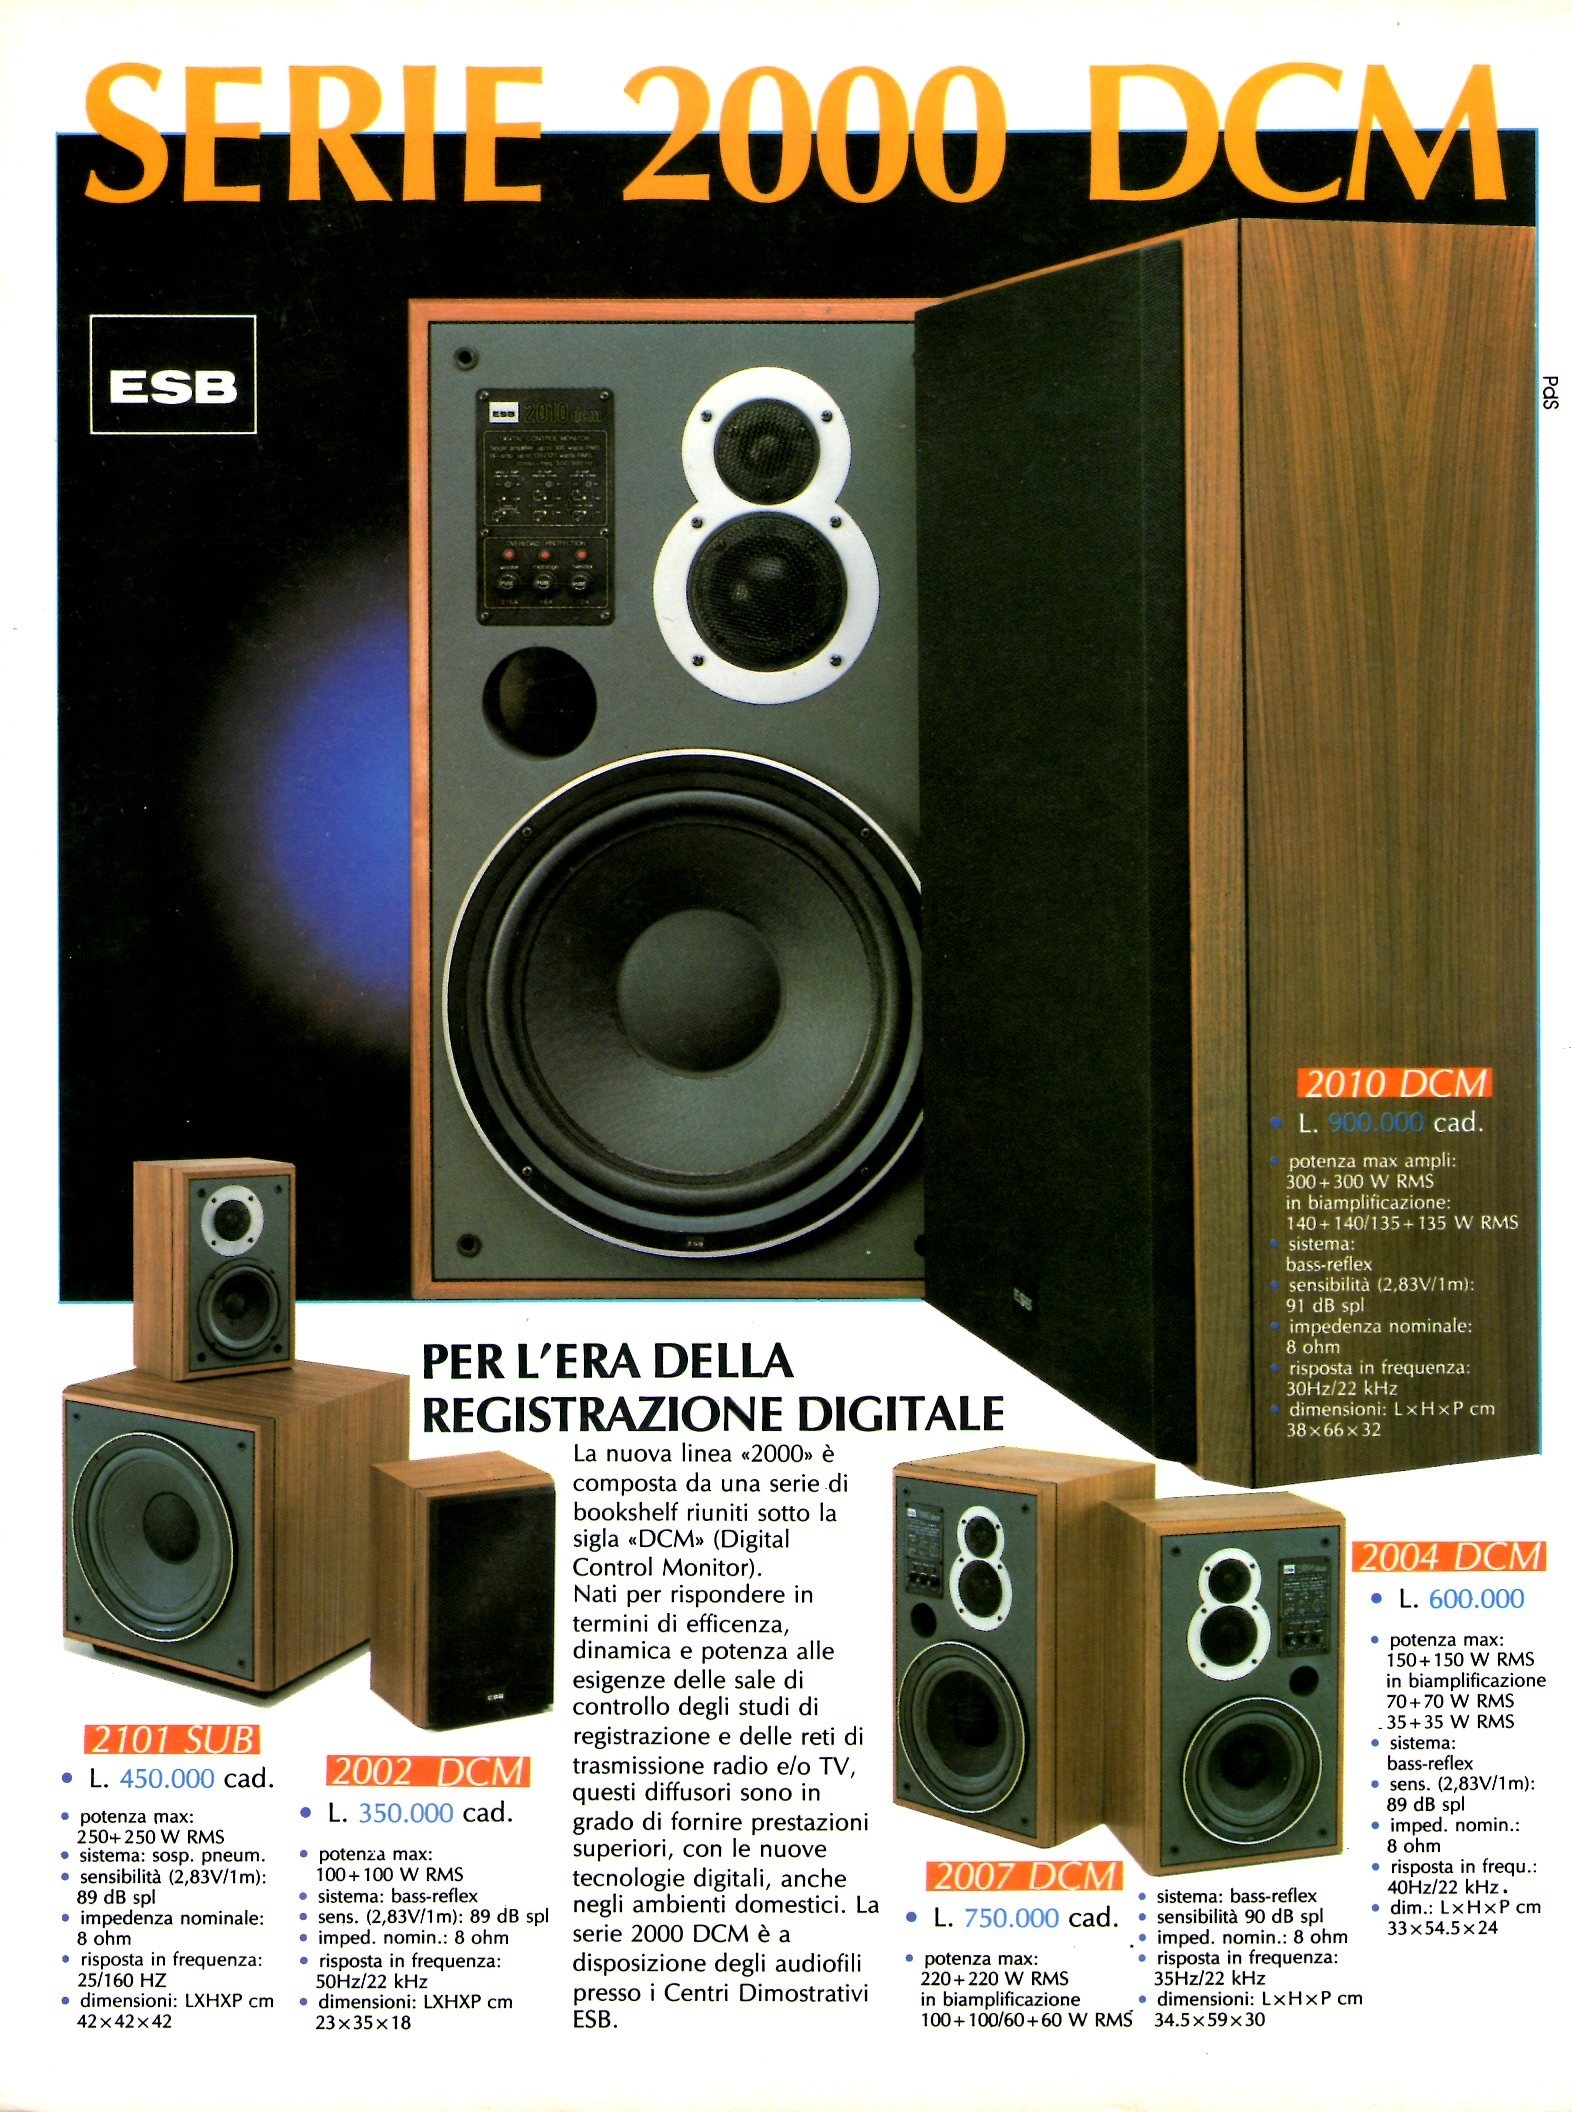 ESB DCM series